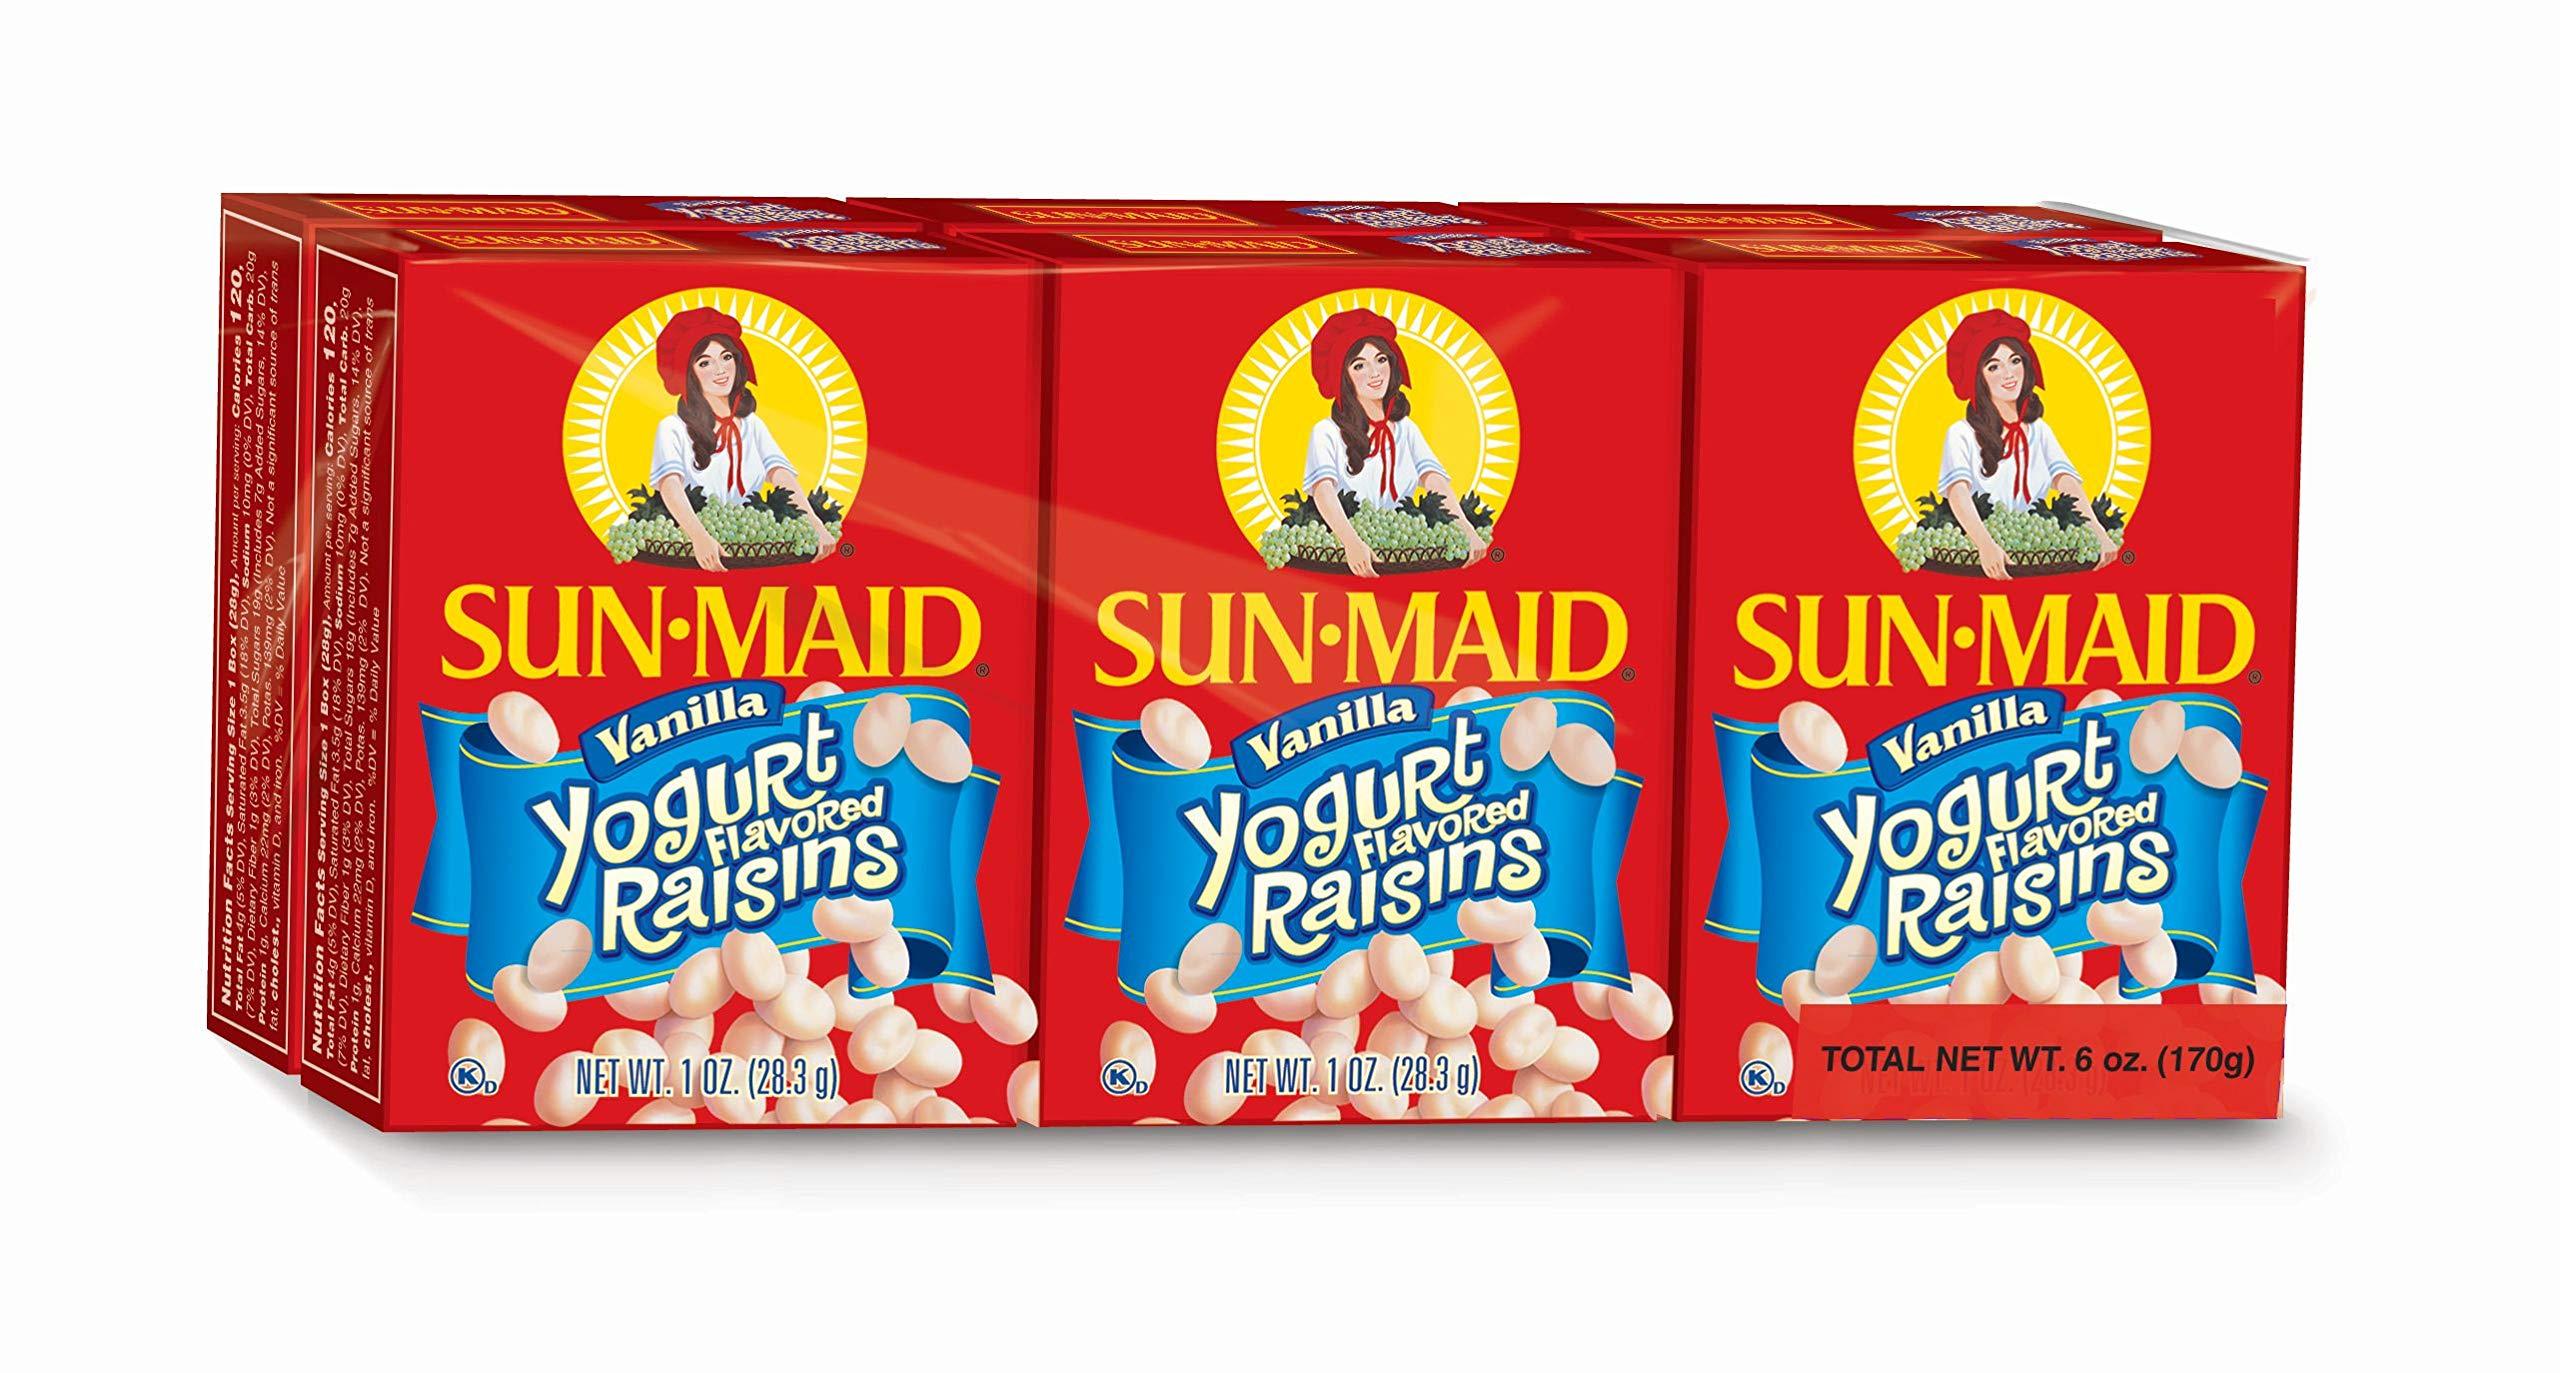 Sun-Maid Vanilla Yogurt Raisins, 1-Ounce (6 Count)